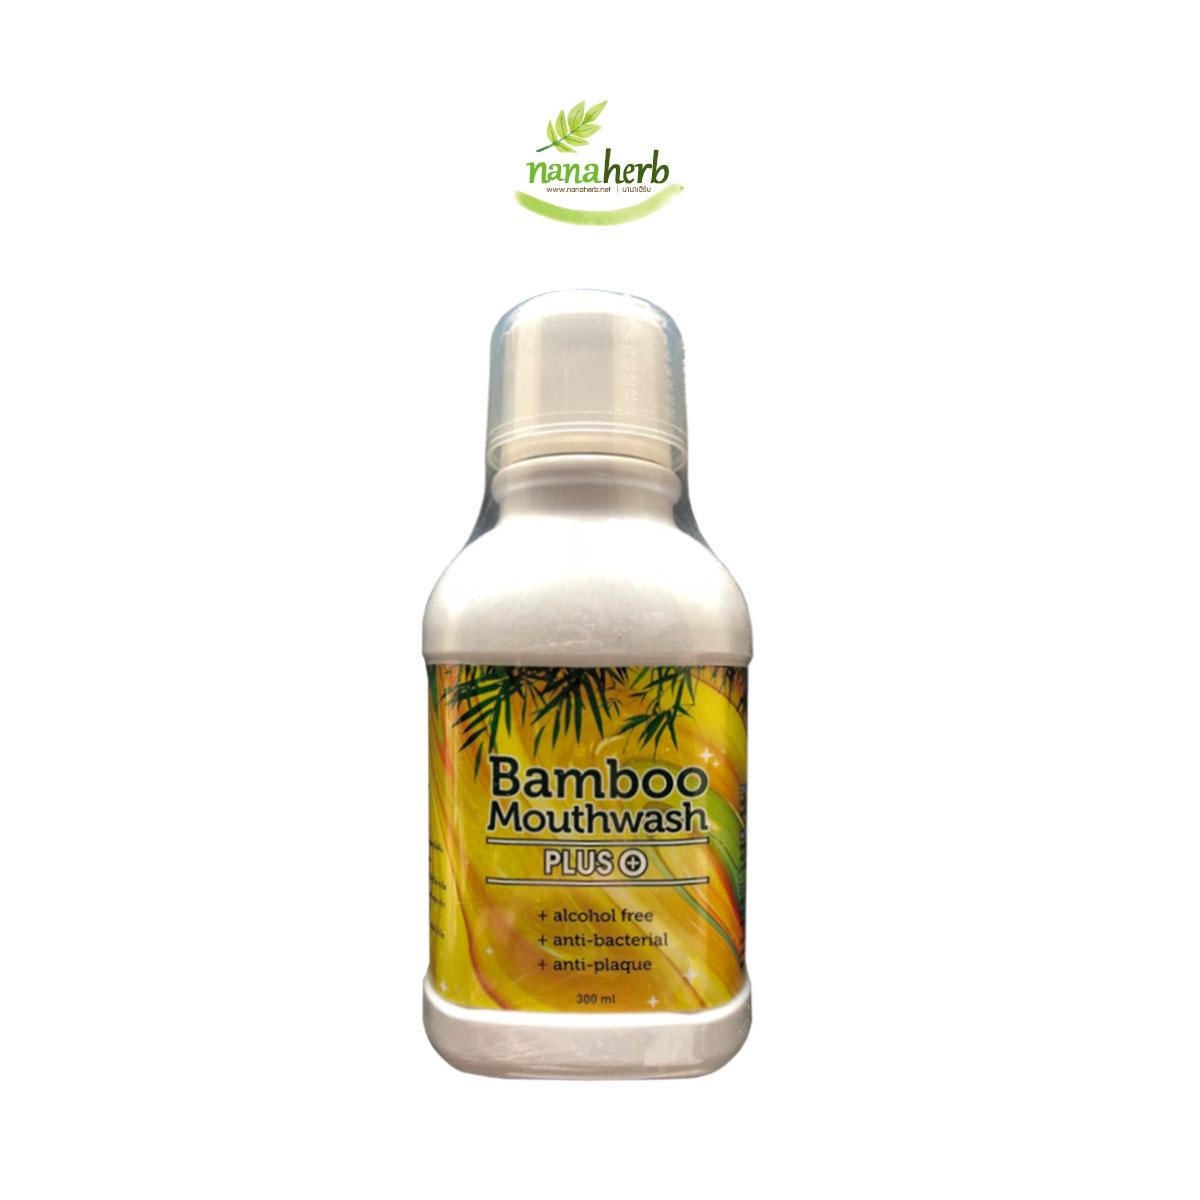 Bamboo Mouthwash (แบมบู เม้าท์วอช)